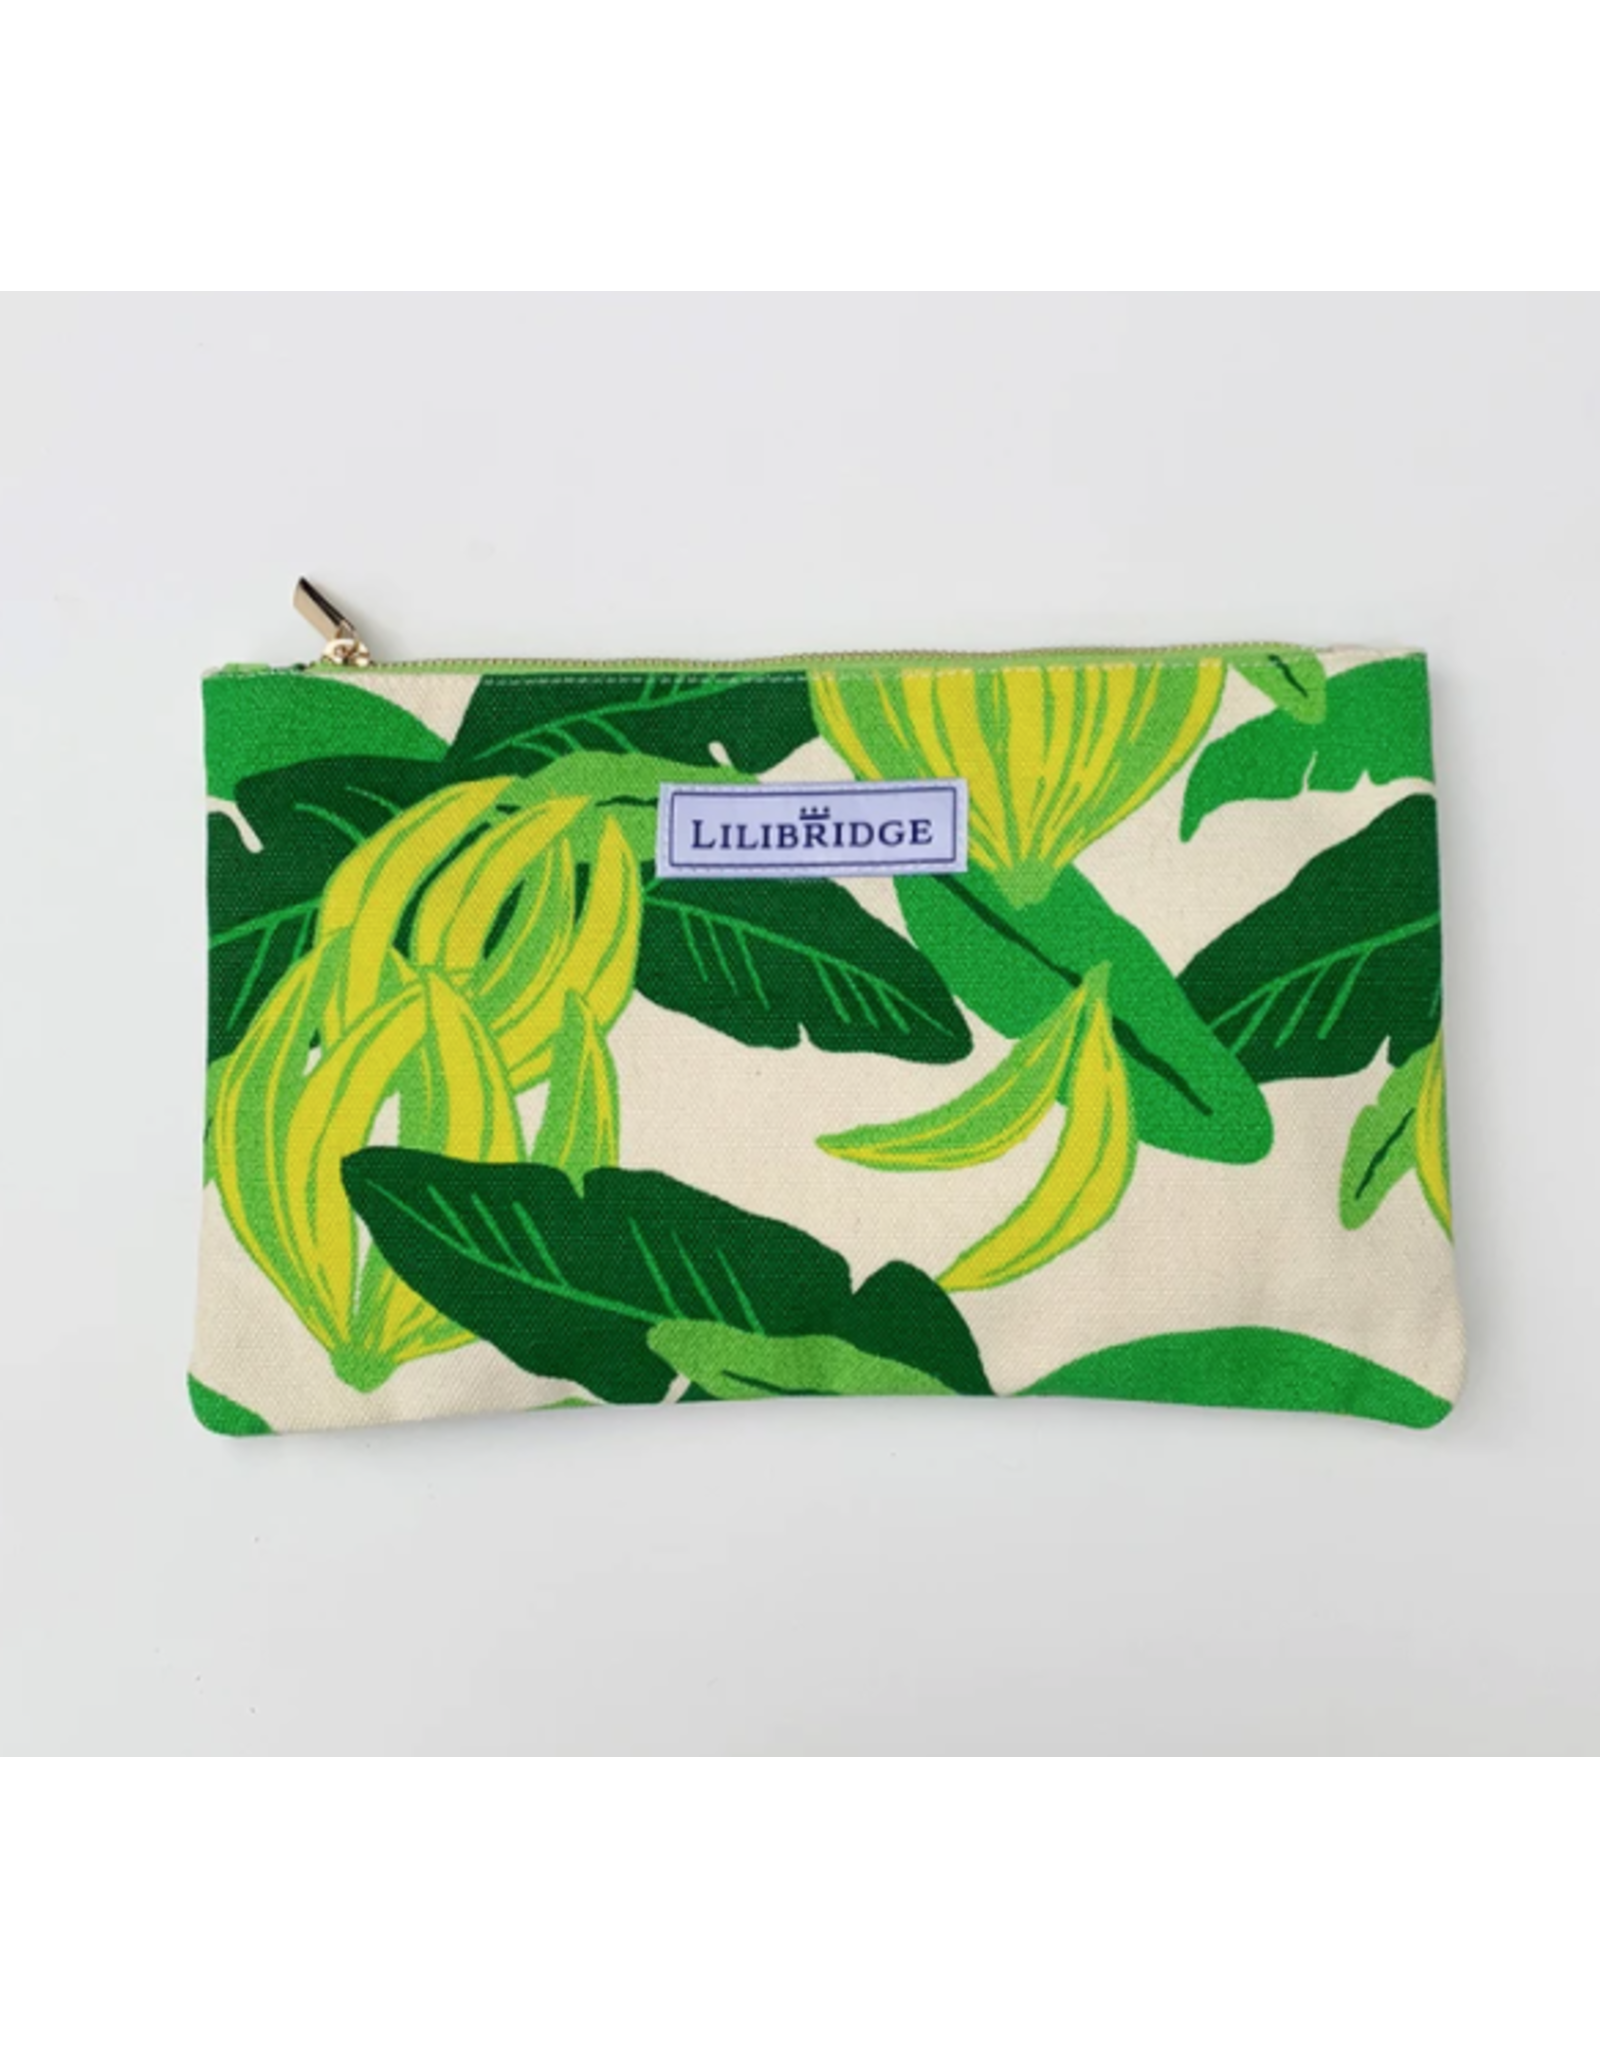 Lilibridge Bananas  Clutch by Lilibridge